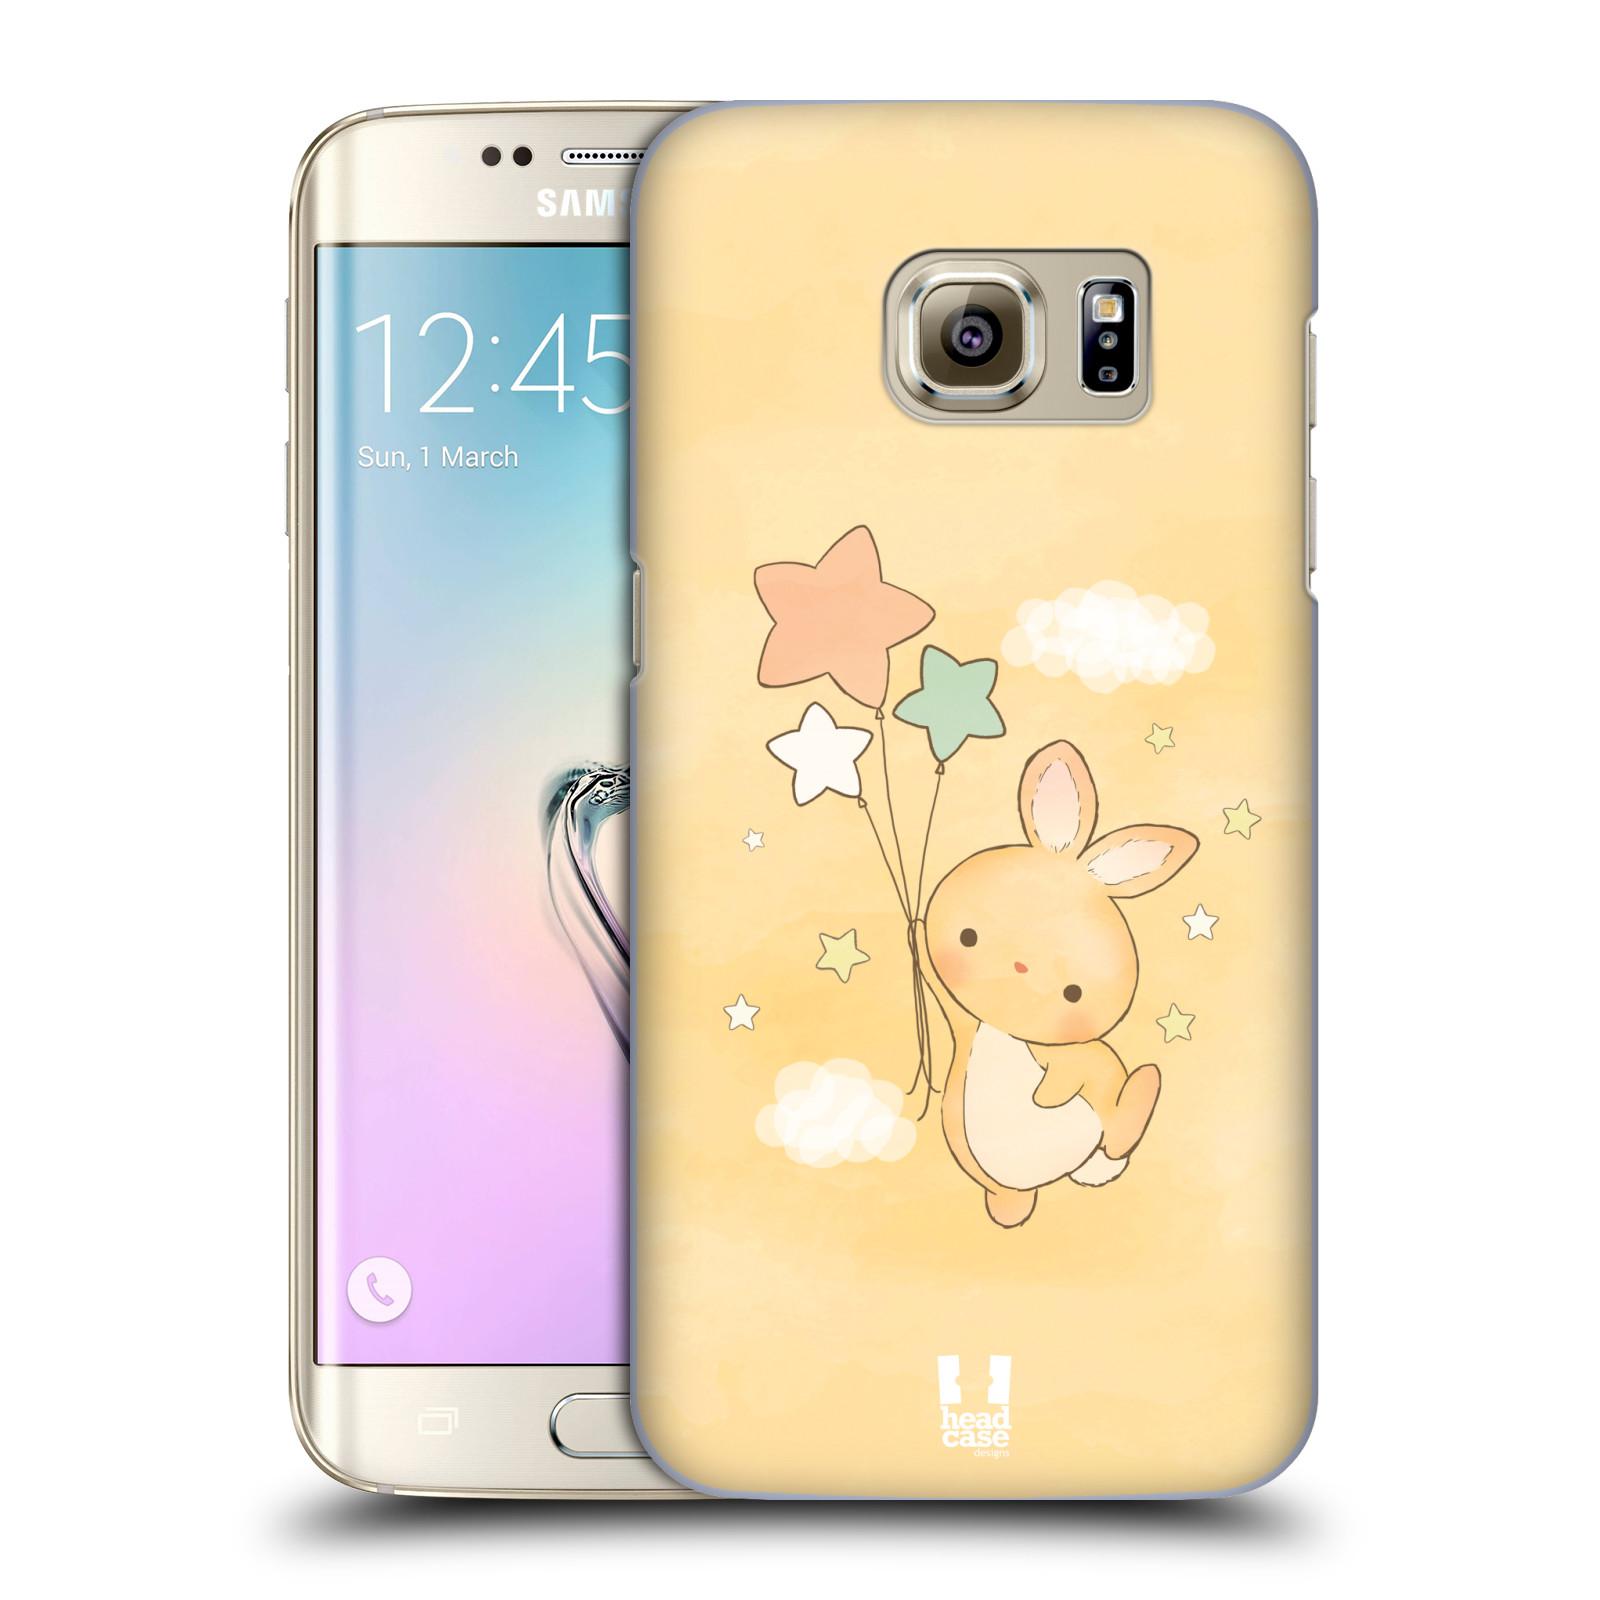 HEAD CASE plastový obal na mobil SAMSUNG GALAXY S7 EDGE vzor králíček a hvězdy žlutá